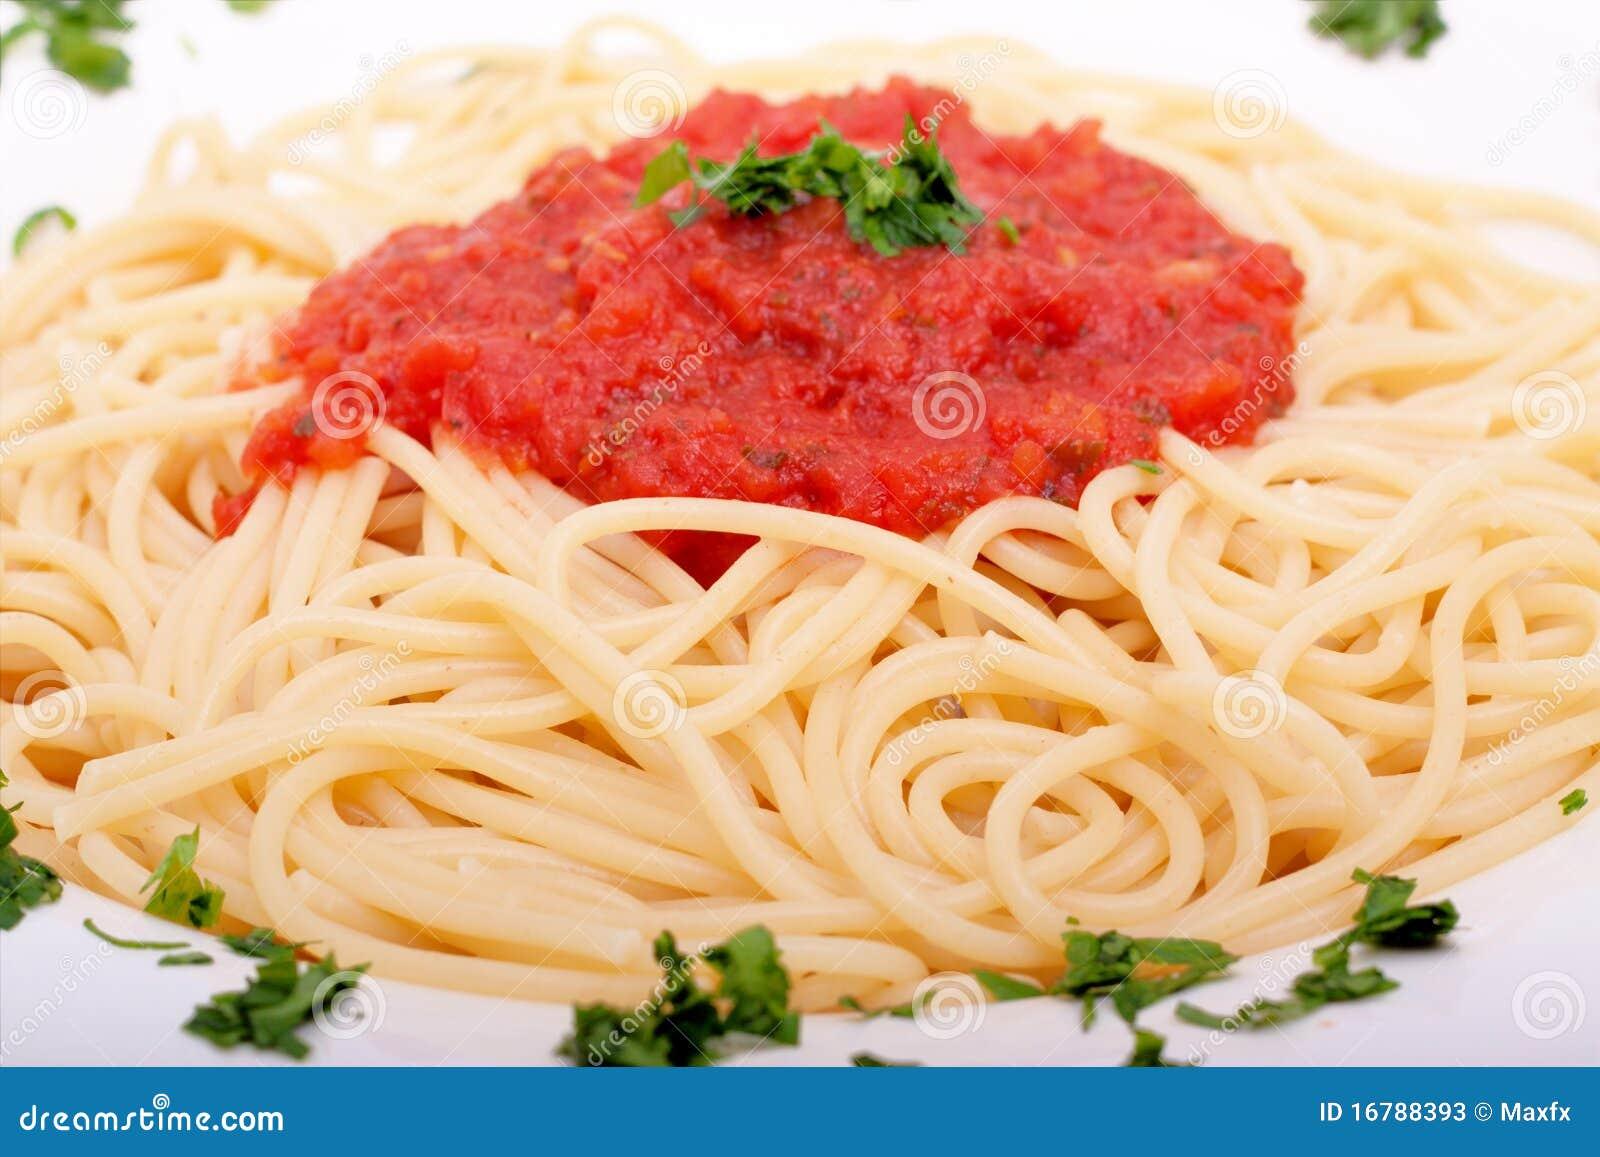 Delicious Homemade Spaghetti With Tomato Sauce Stock Photos - Image ...